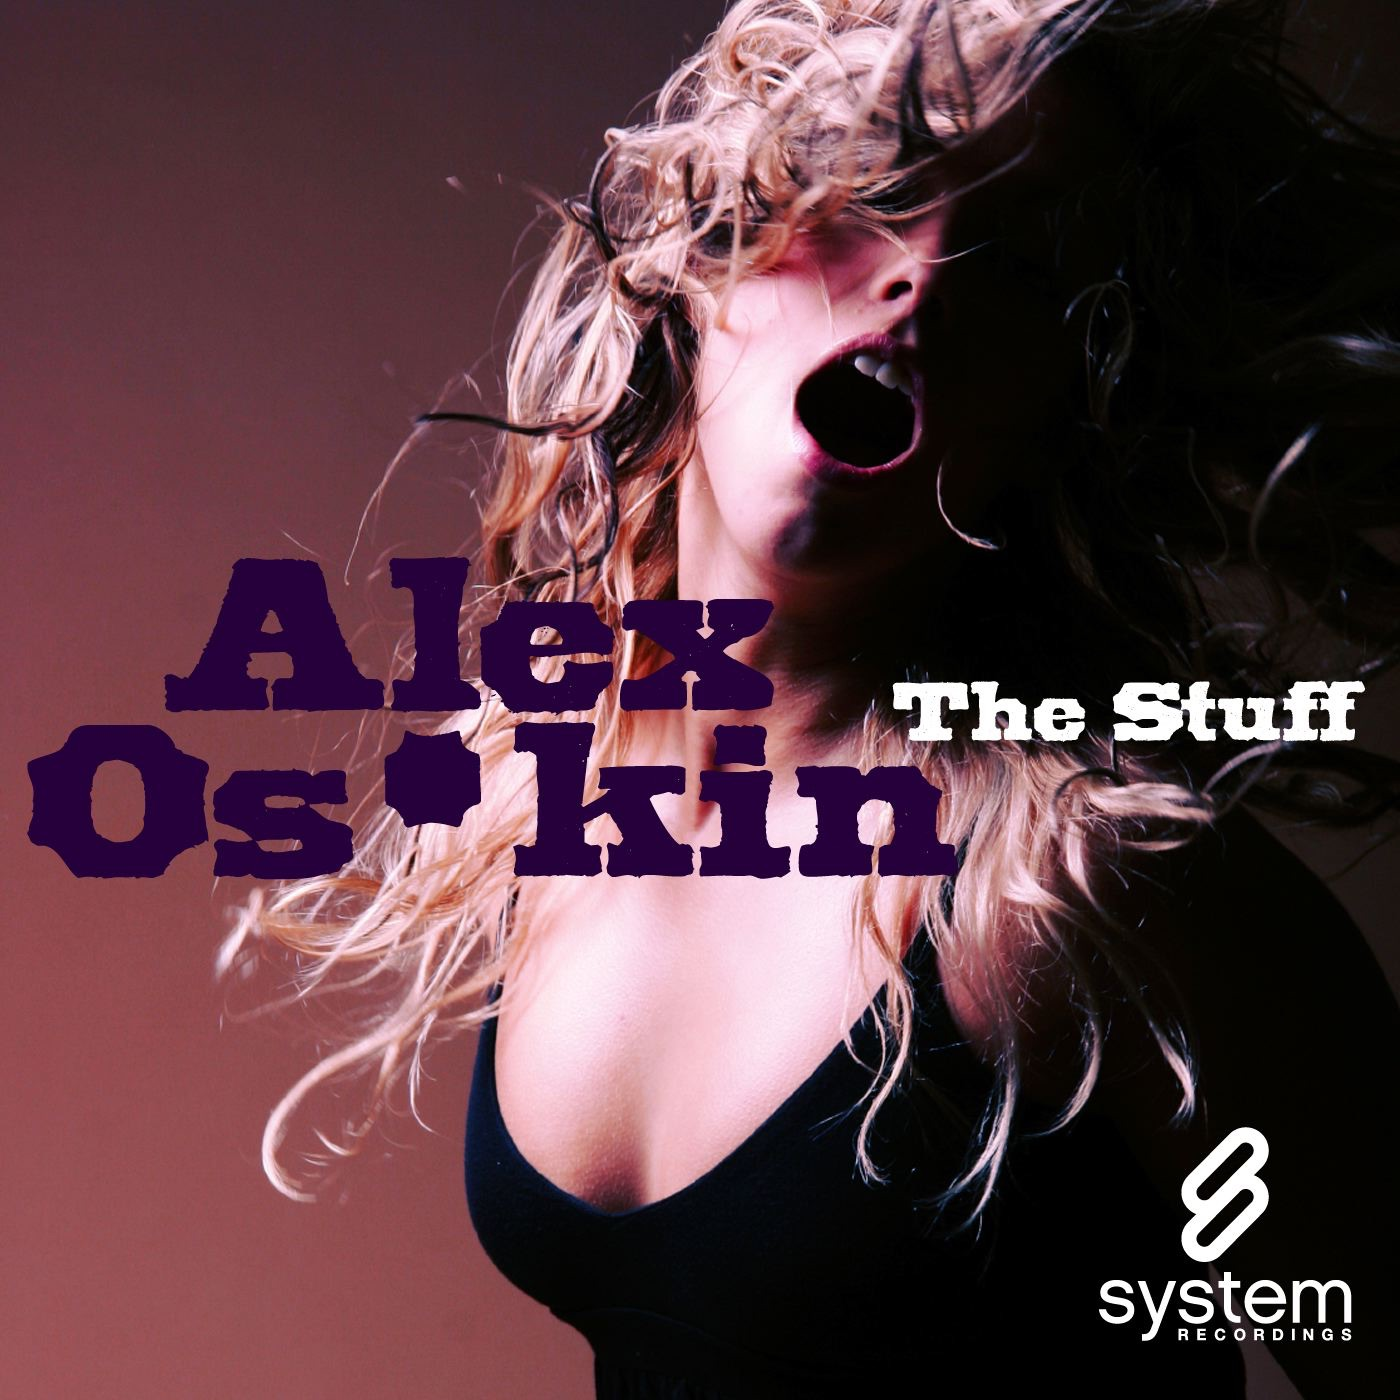 The Stuff - Single